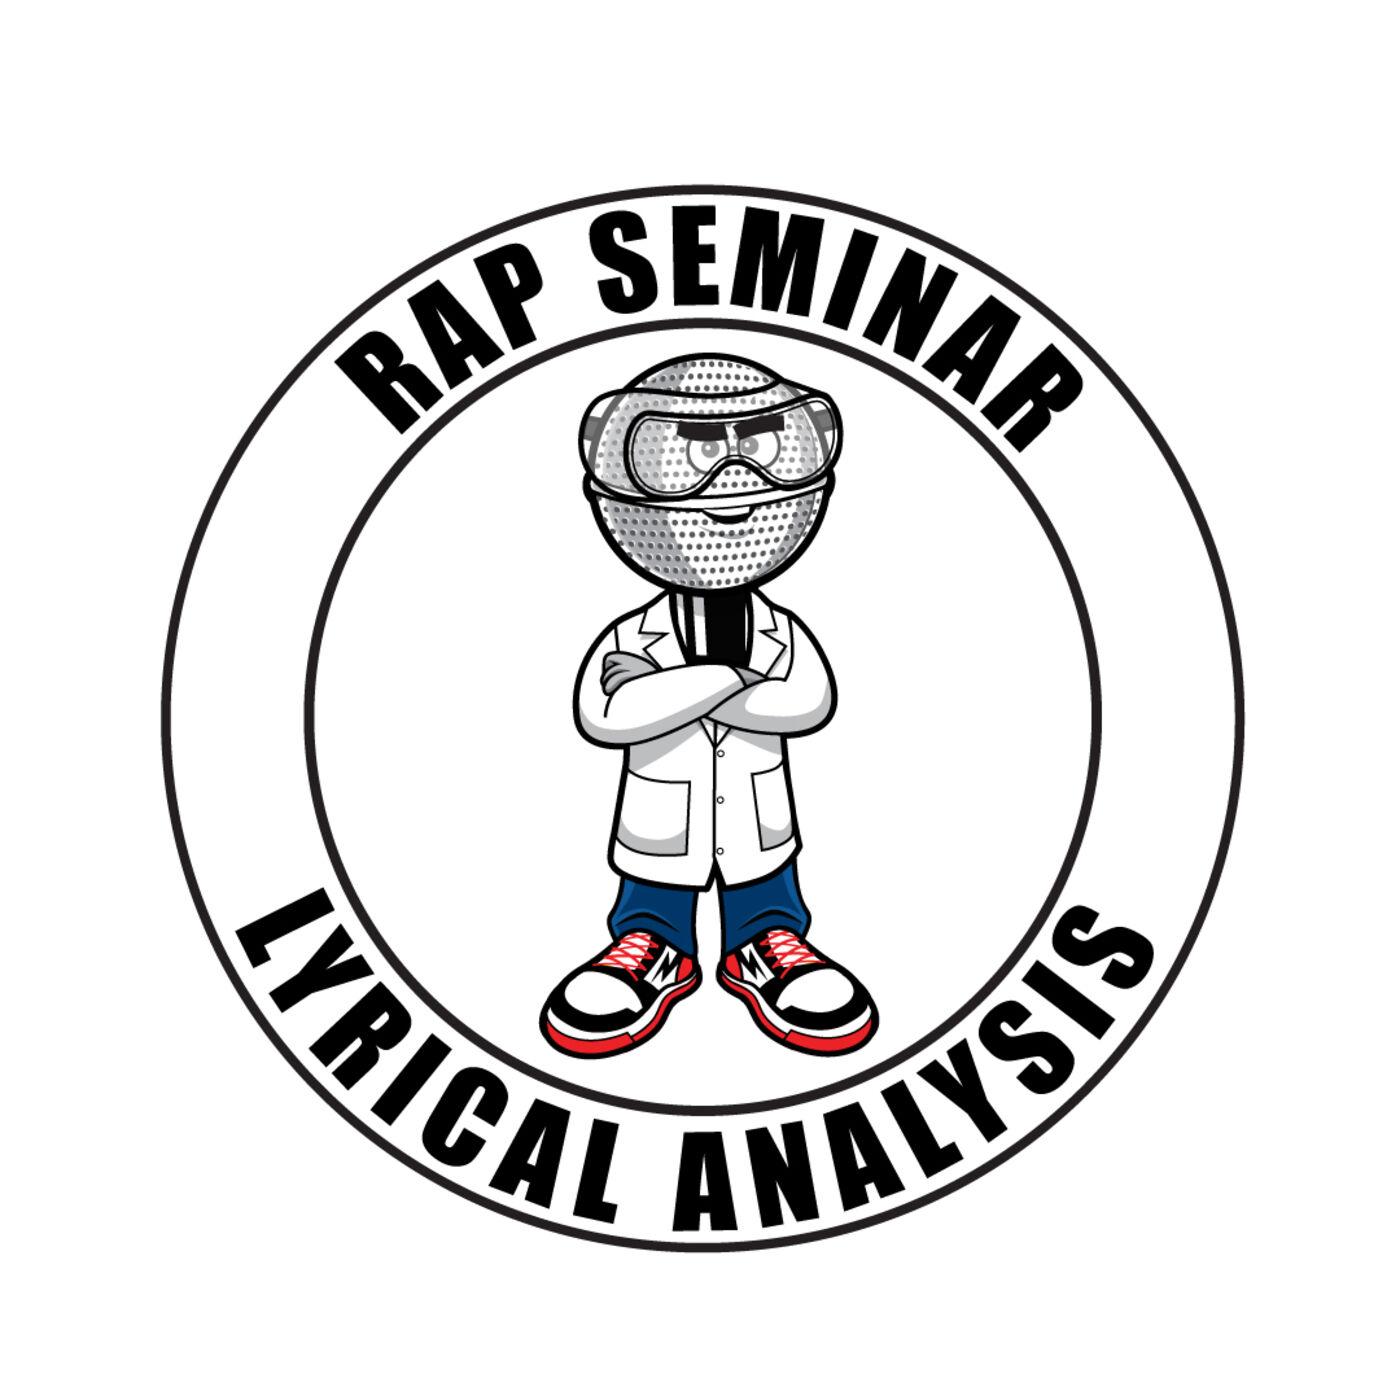 Episode 34: A Chat With Roberto Santos of Rap Seminar